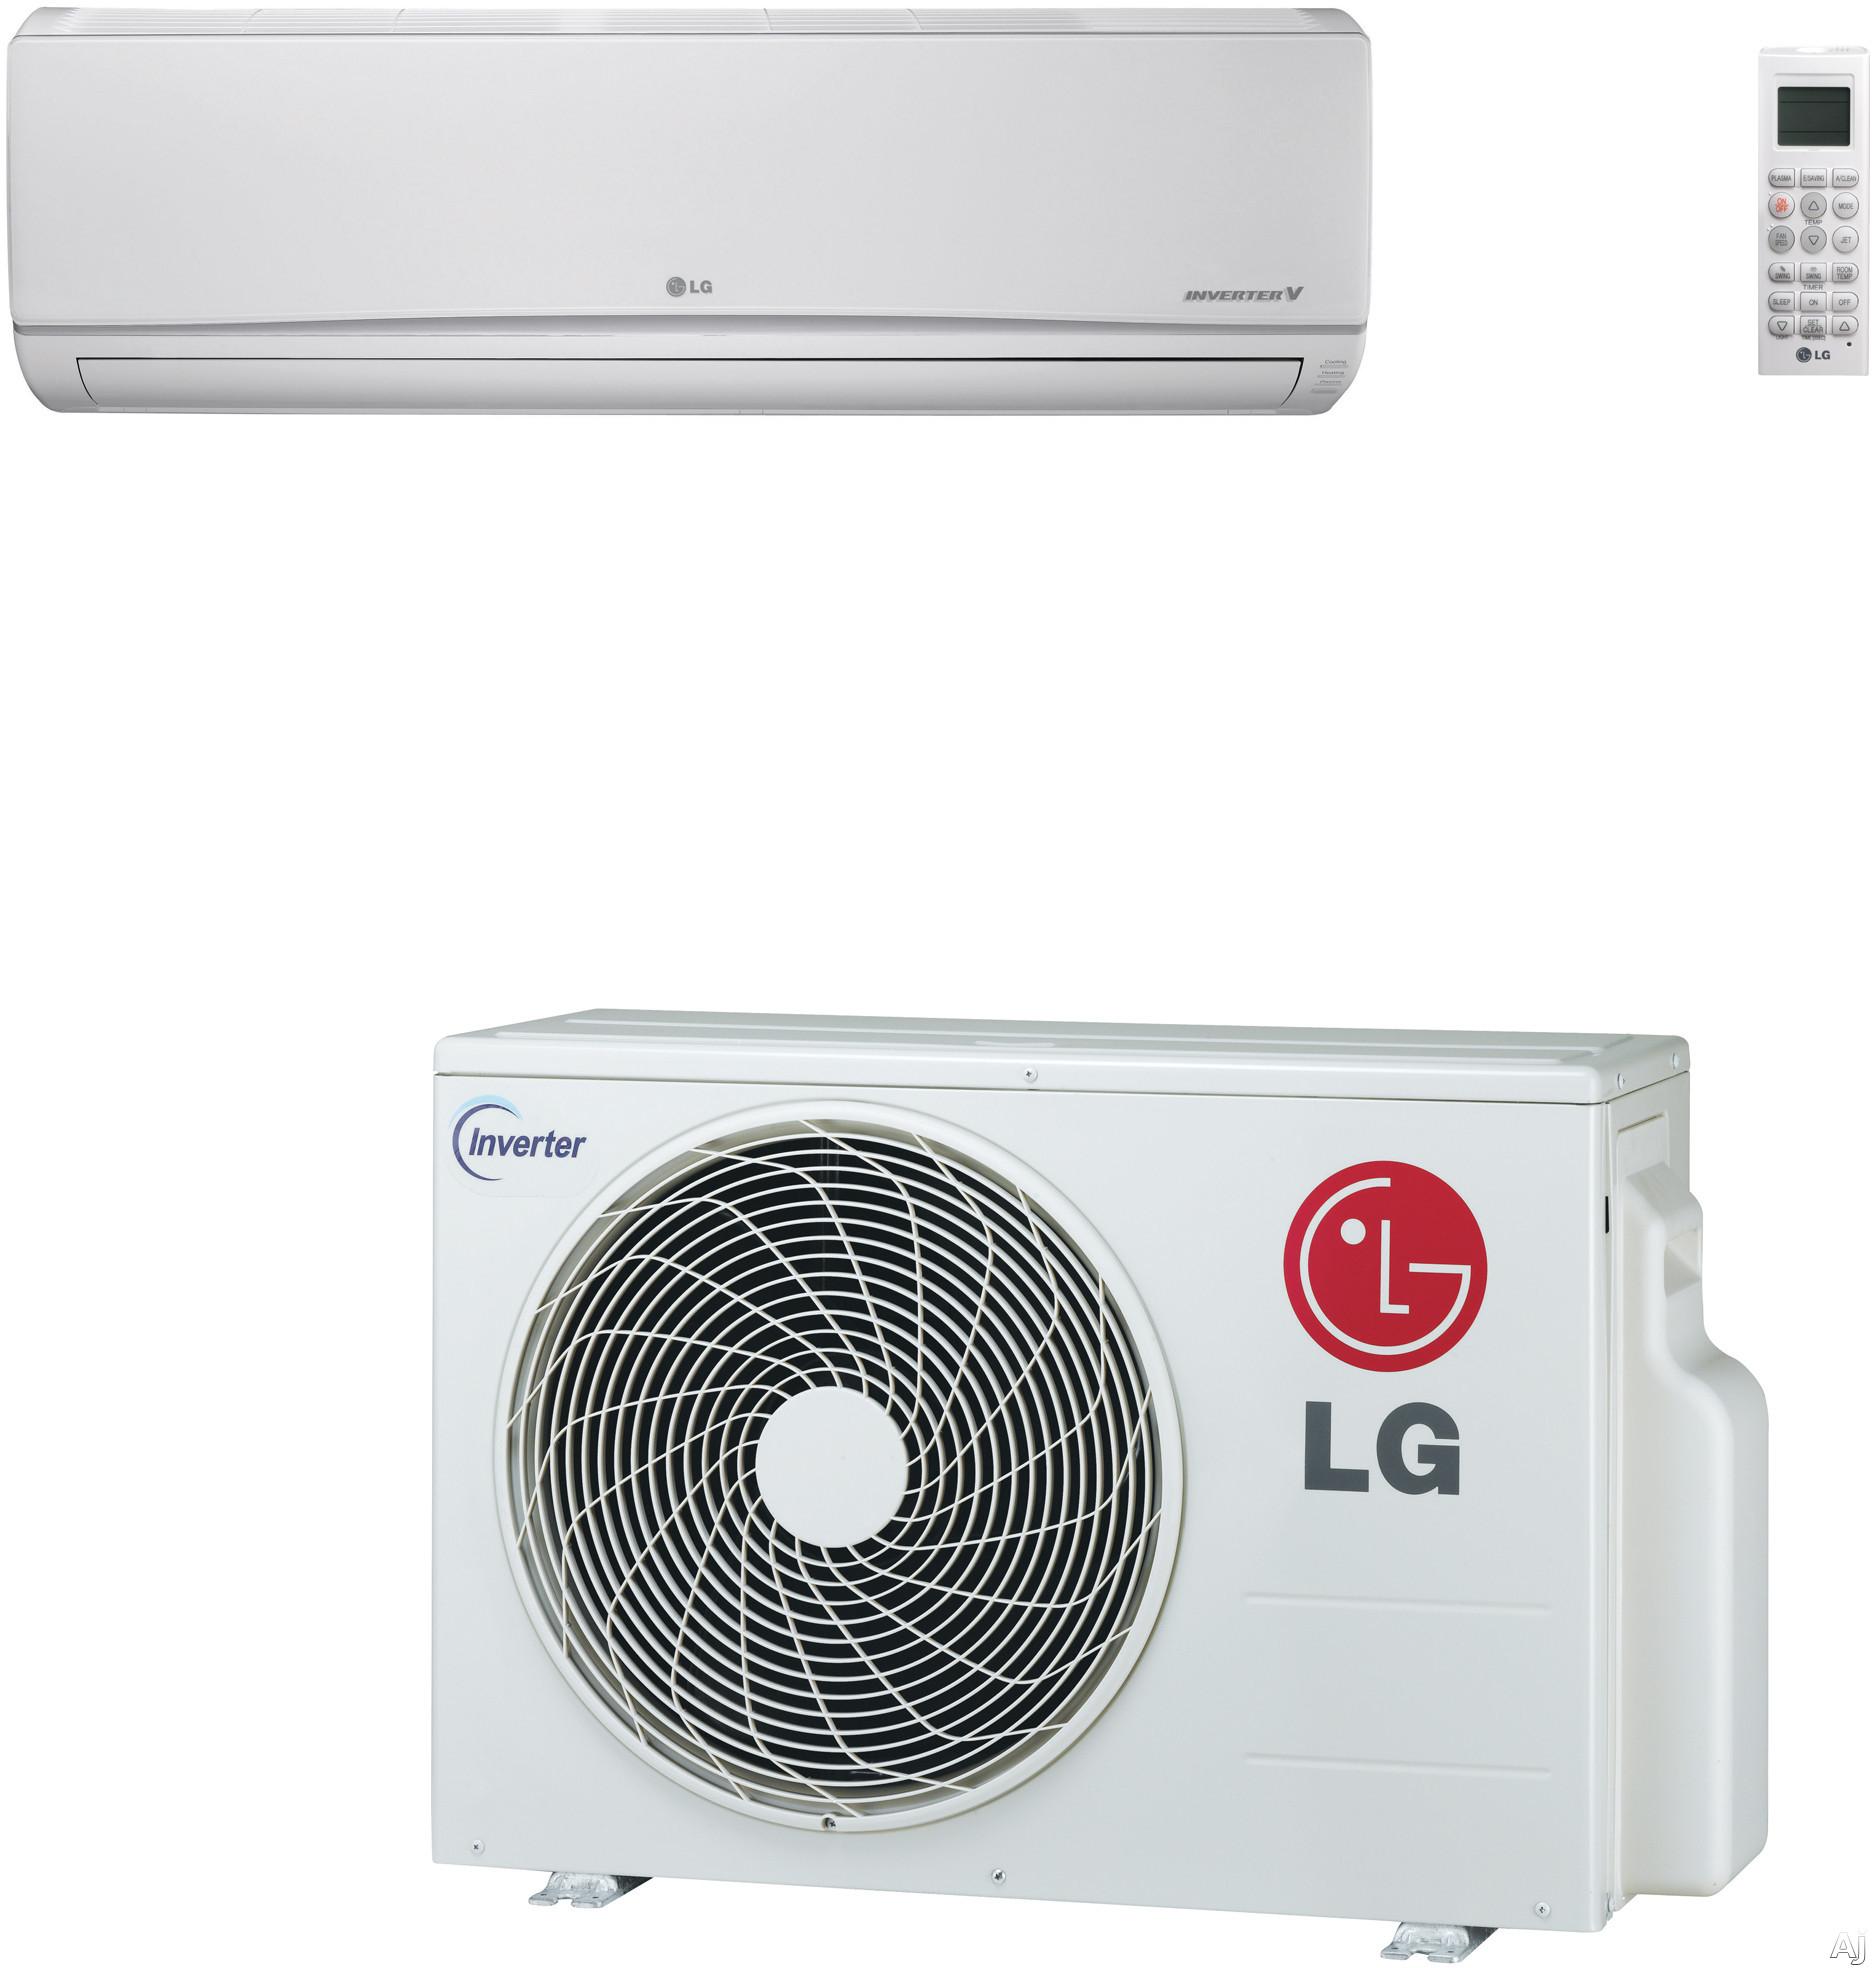 LG LS180HEV 17,000 BTU Mega Single Zone Wall-Mount Ductless Split System with 19,000 BTU Heat Pump, 17.0 SEER, 10.95 EER and Inverter Compressor (LSN180HEV Indoor / LSU180HEV Outdoor) LS180HEV